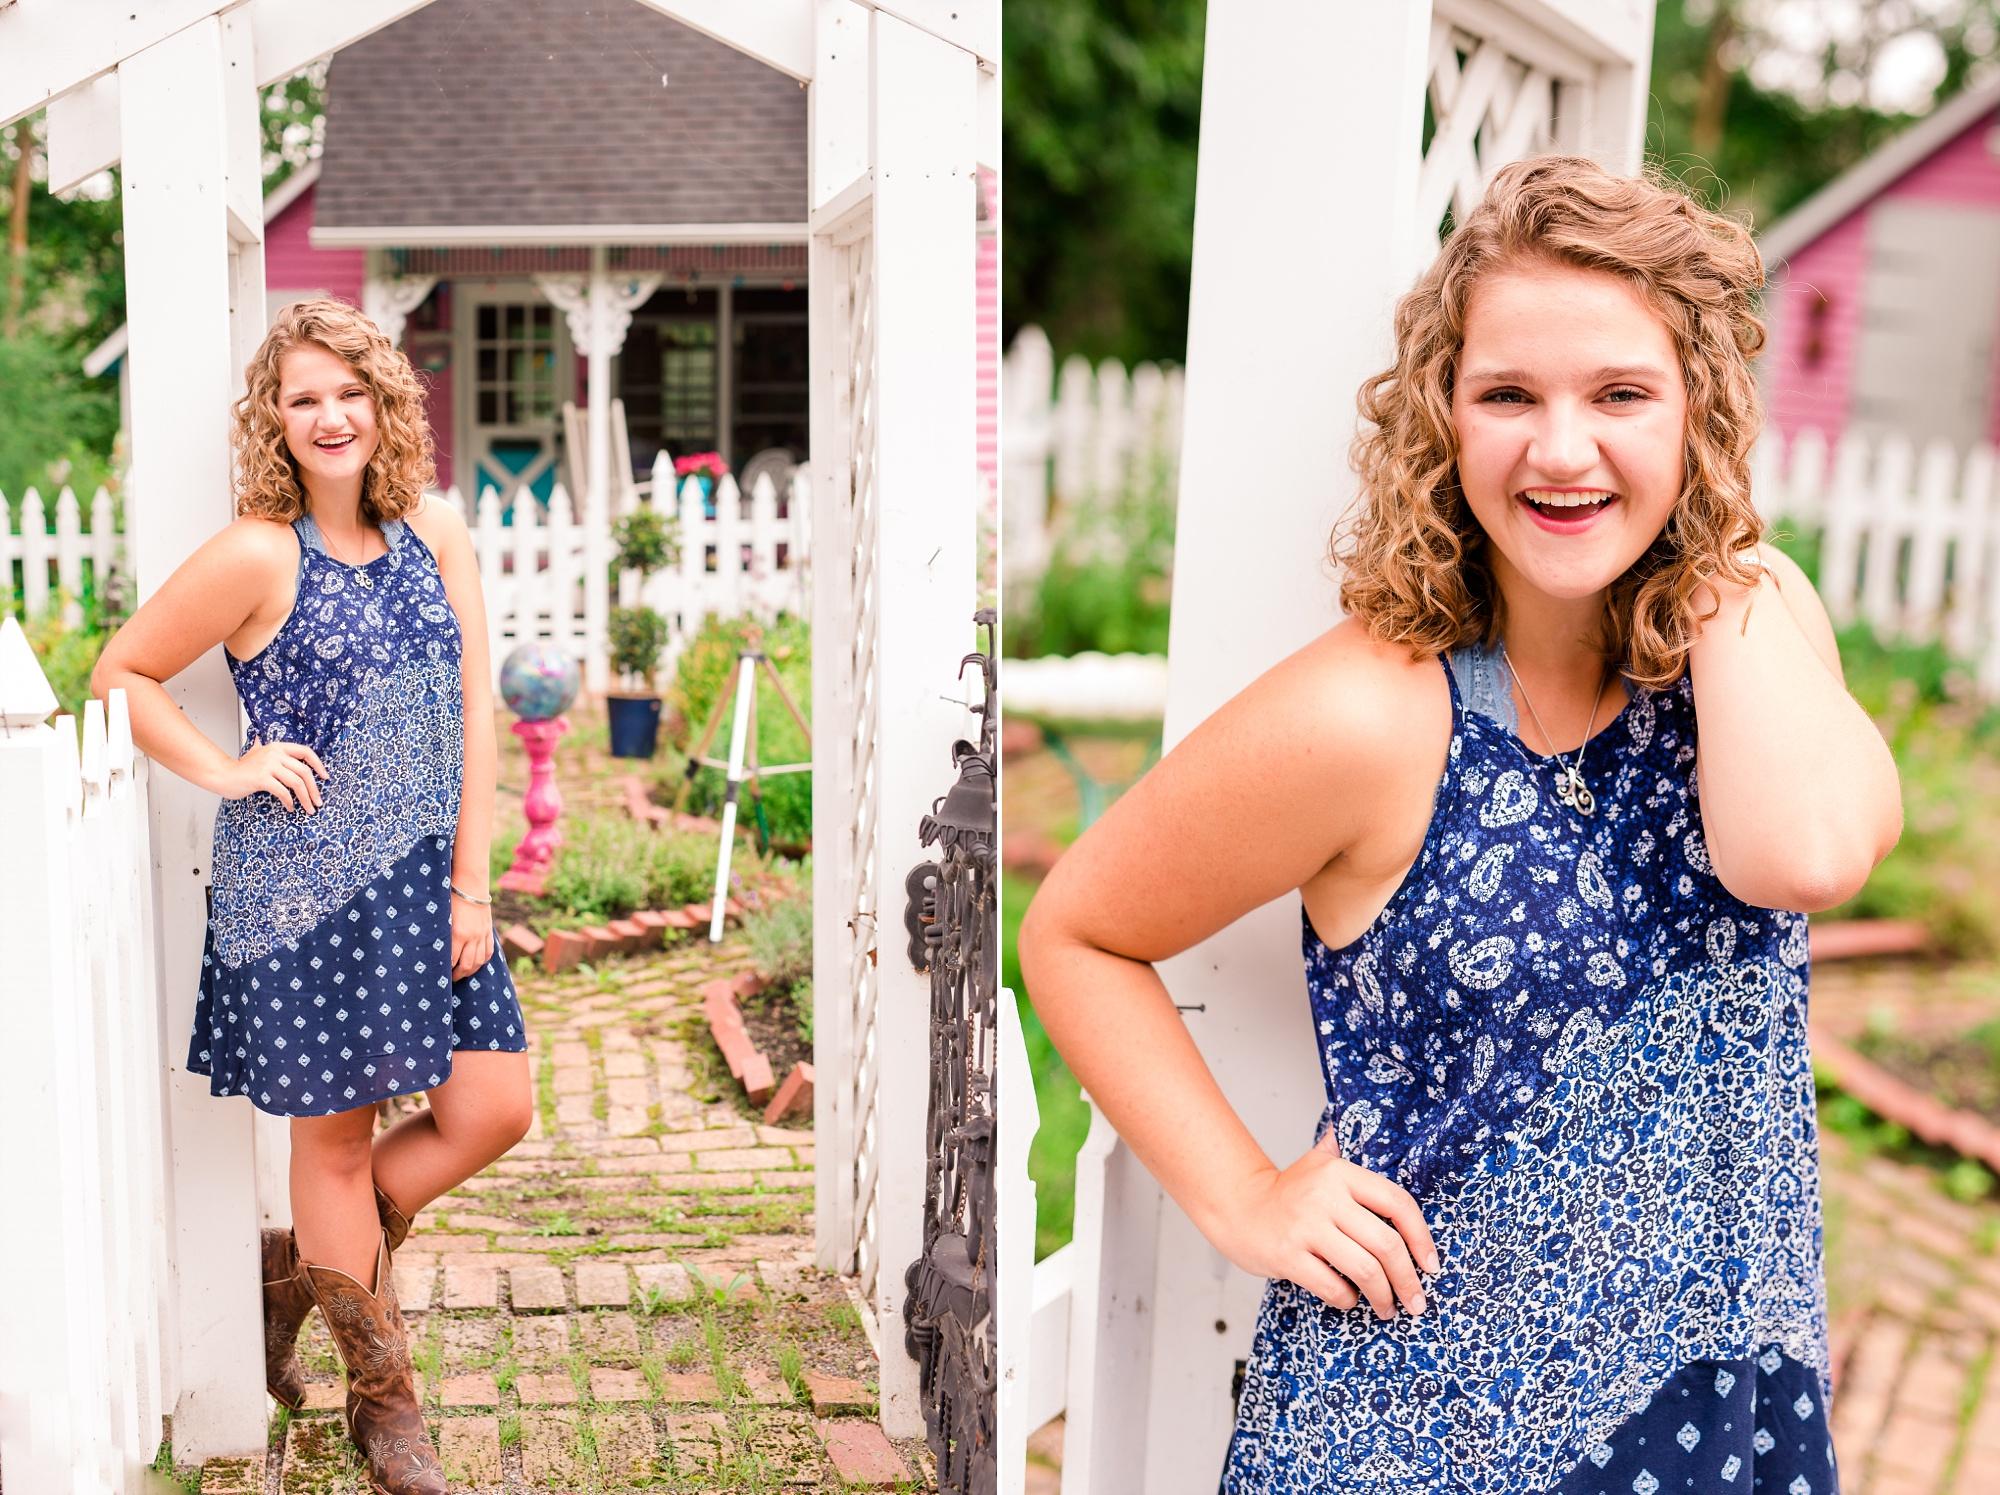 AmberLangerudPhotography_Lakeside Senior Pictures_2772.jpg